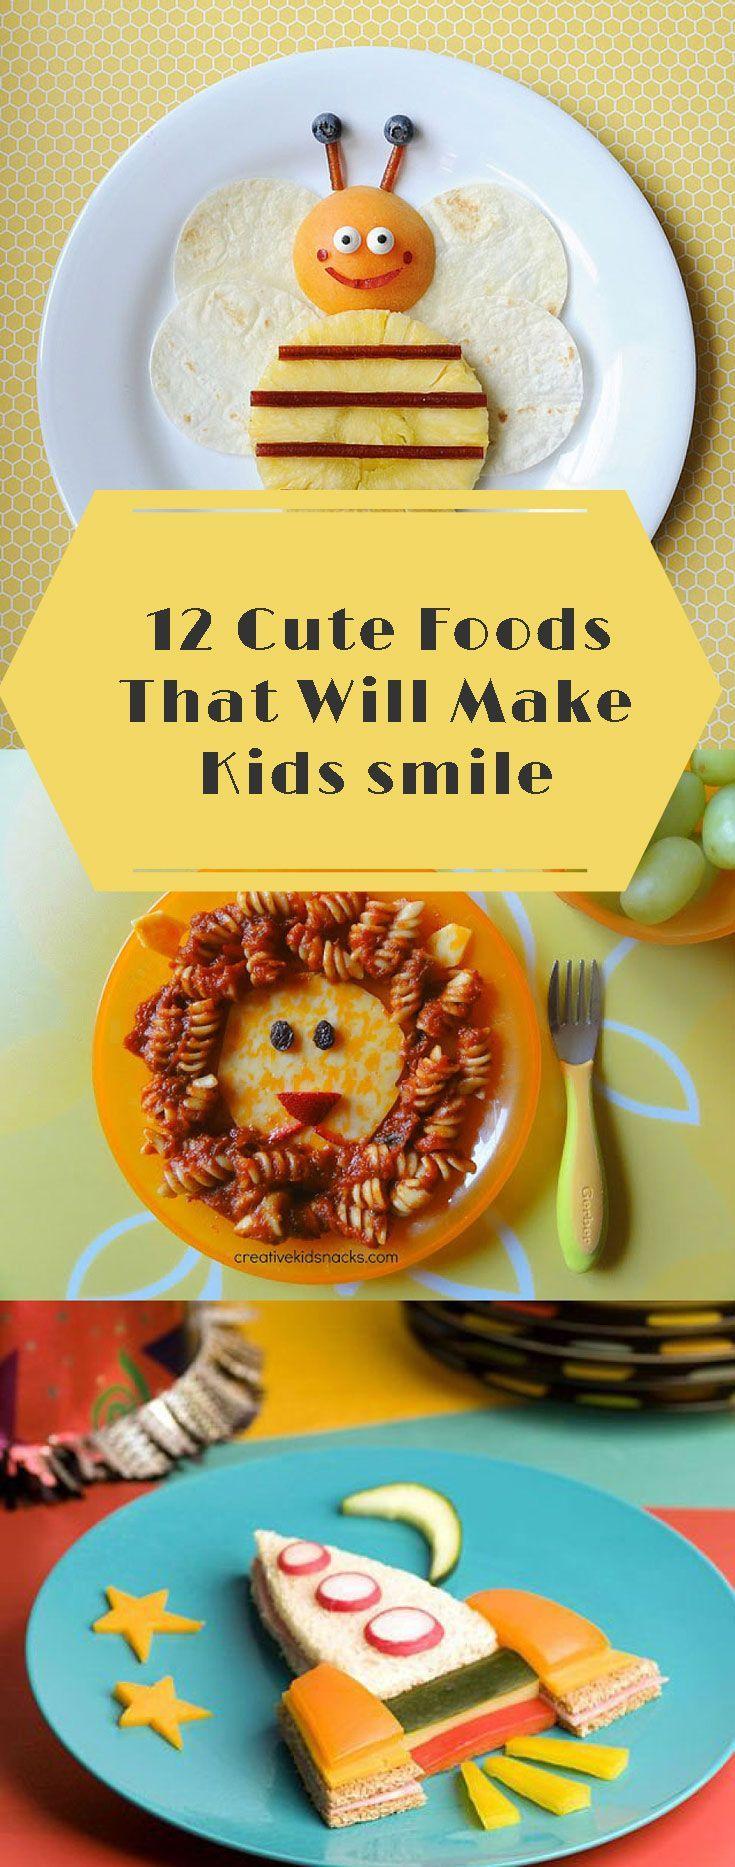 12 Cute Kids Foods Thatll Make Them Smile